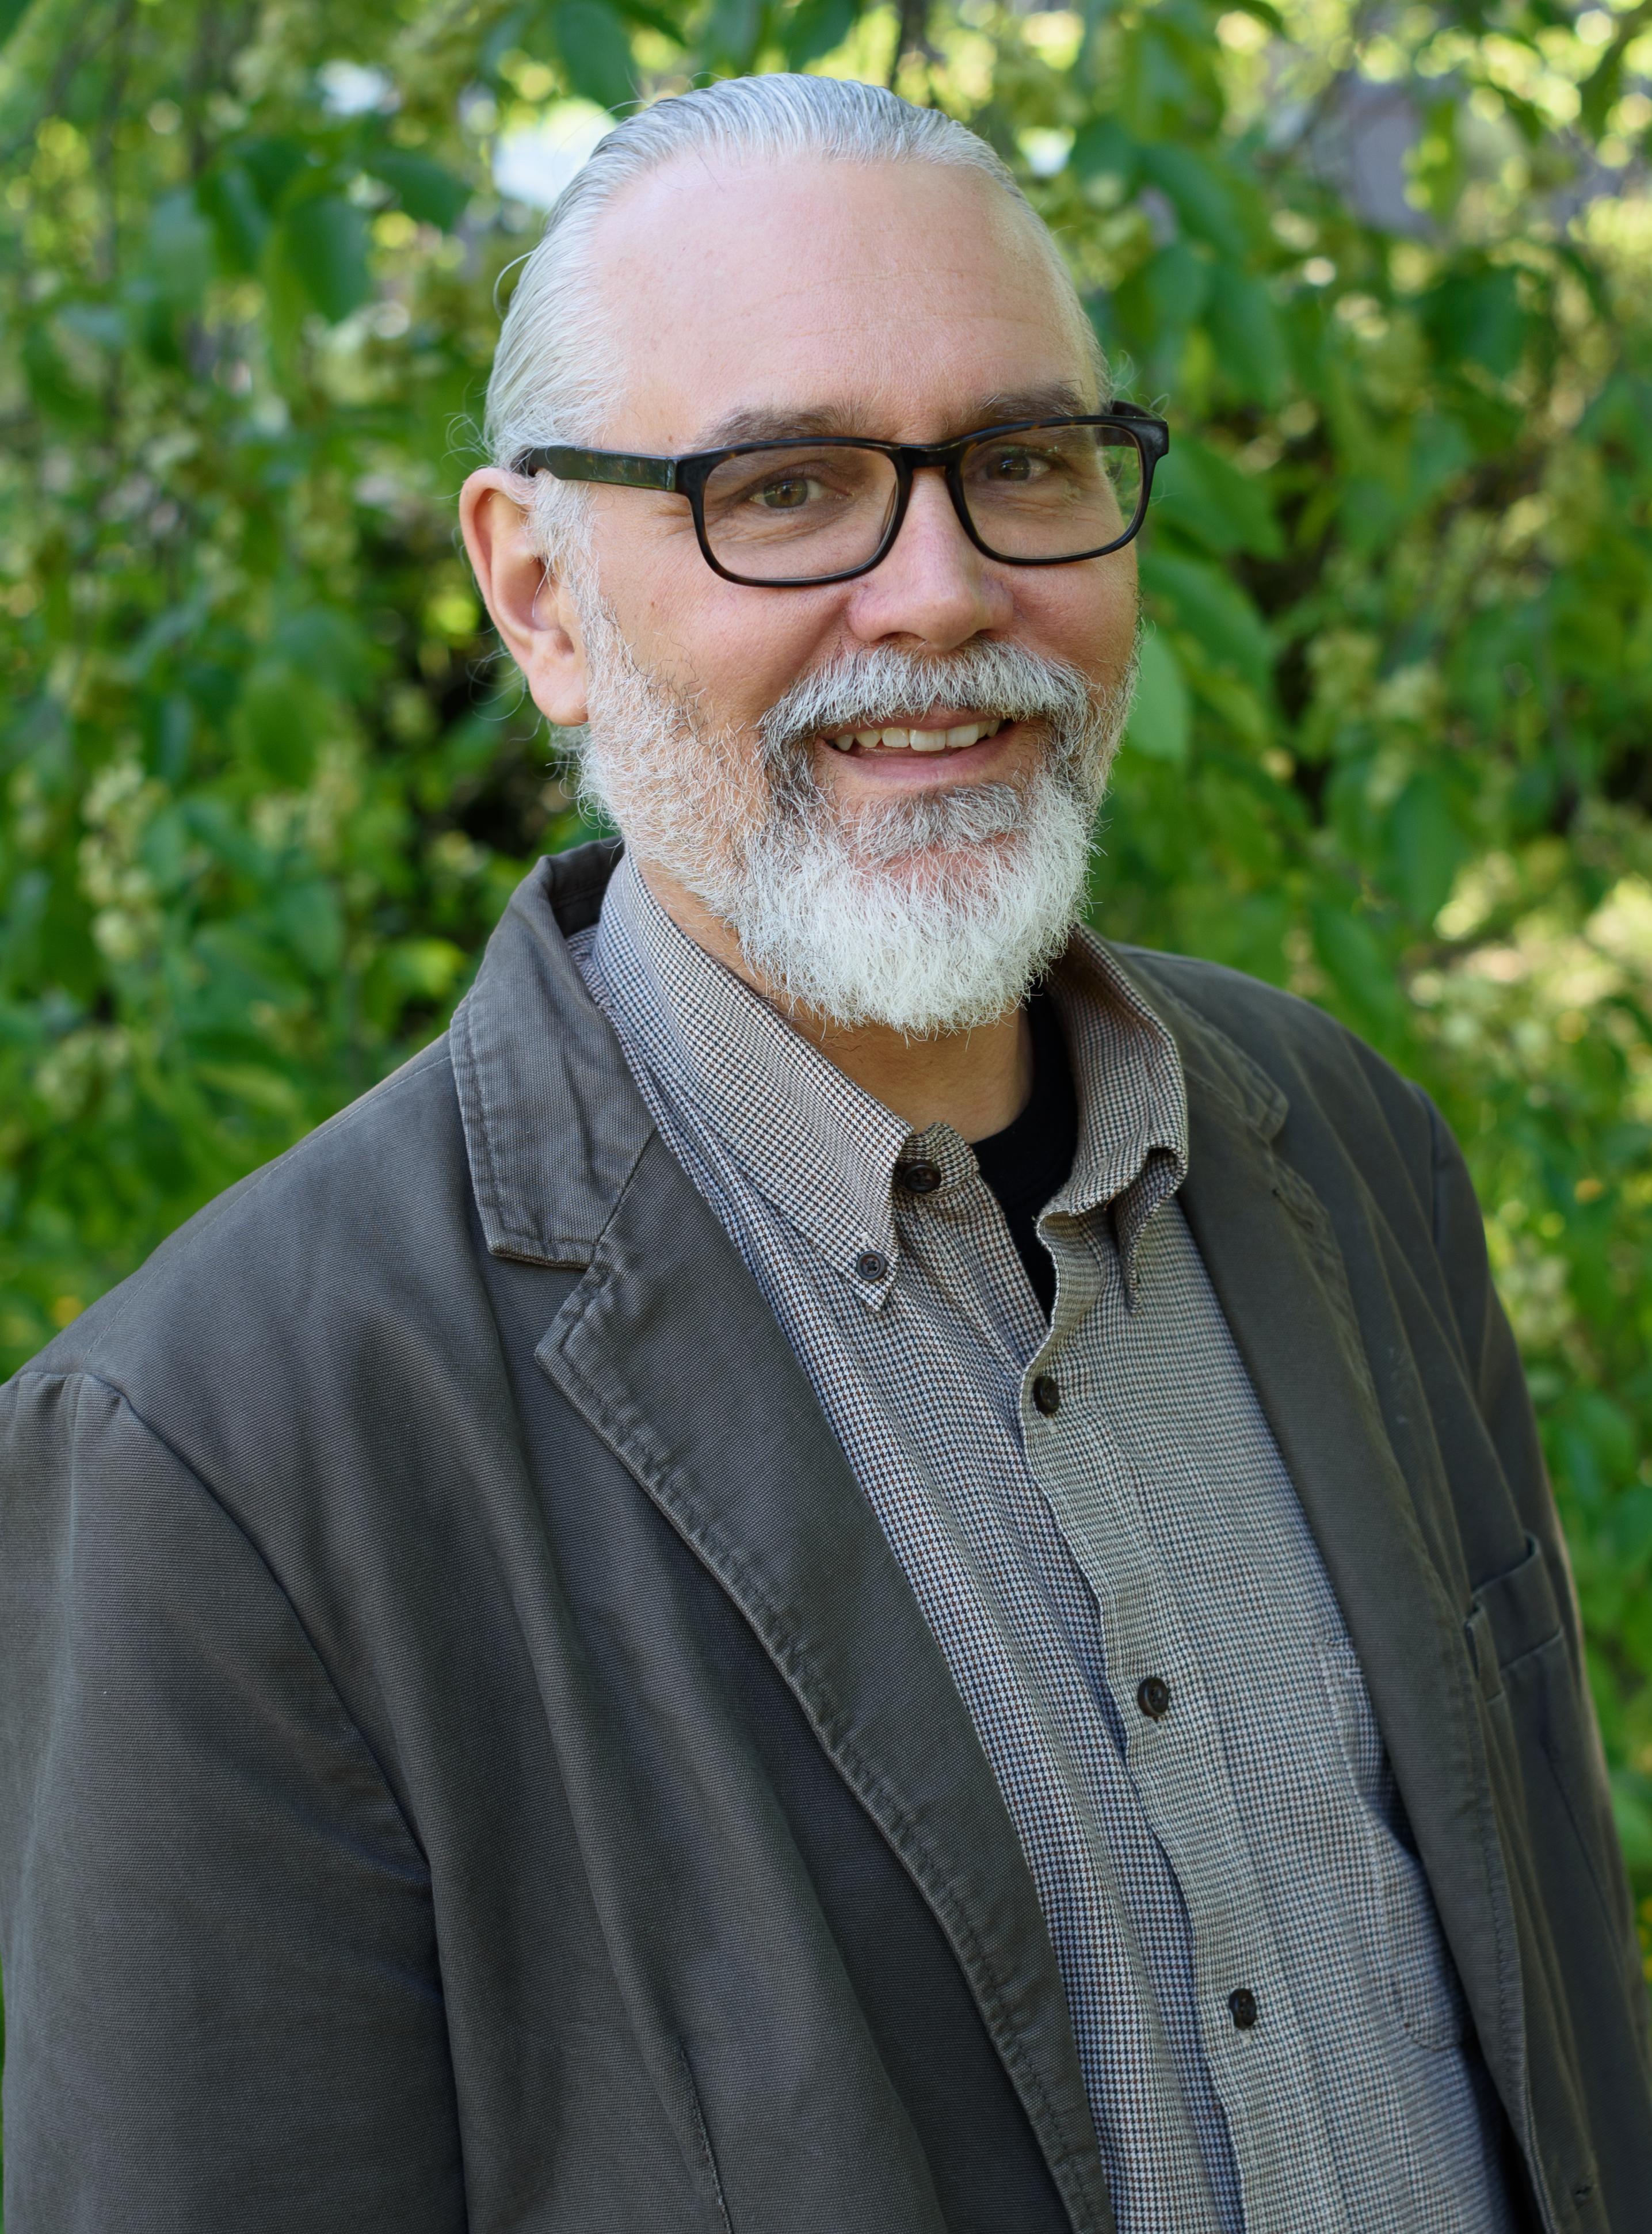 Kirk Overmyer